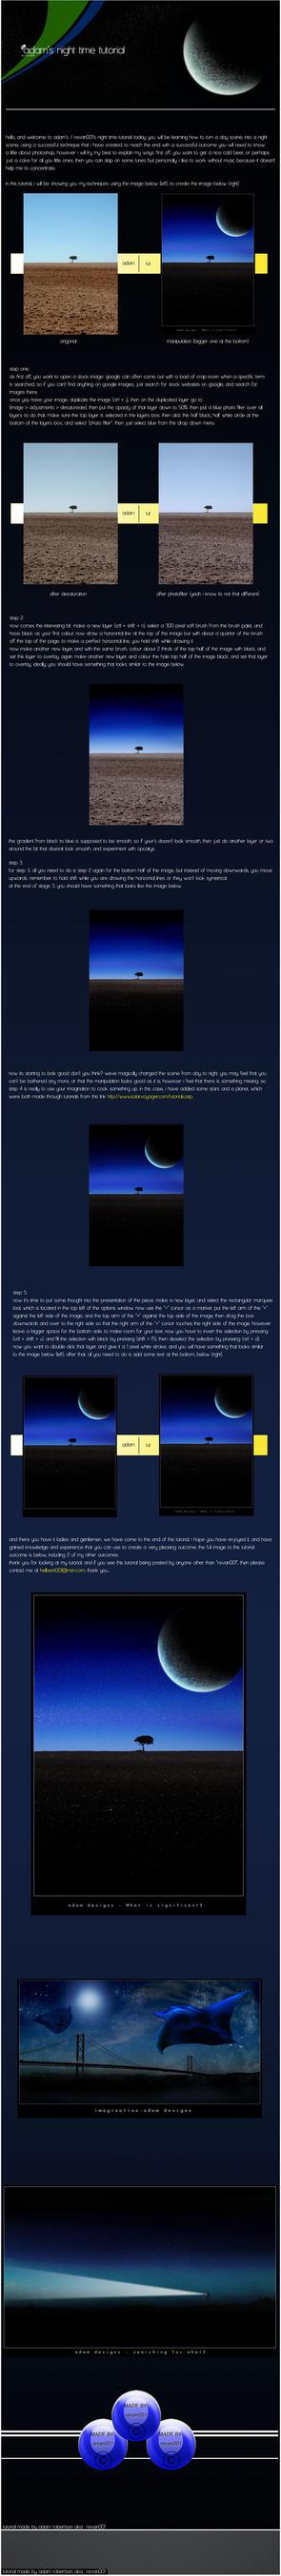 night time tutorial by revan001